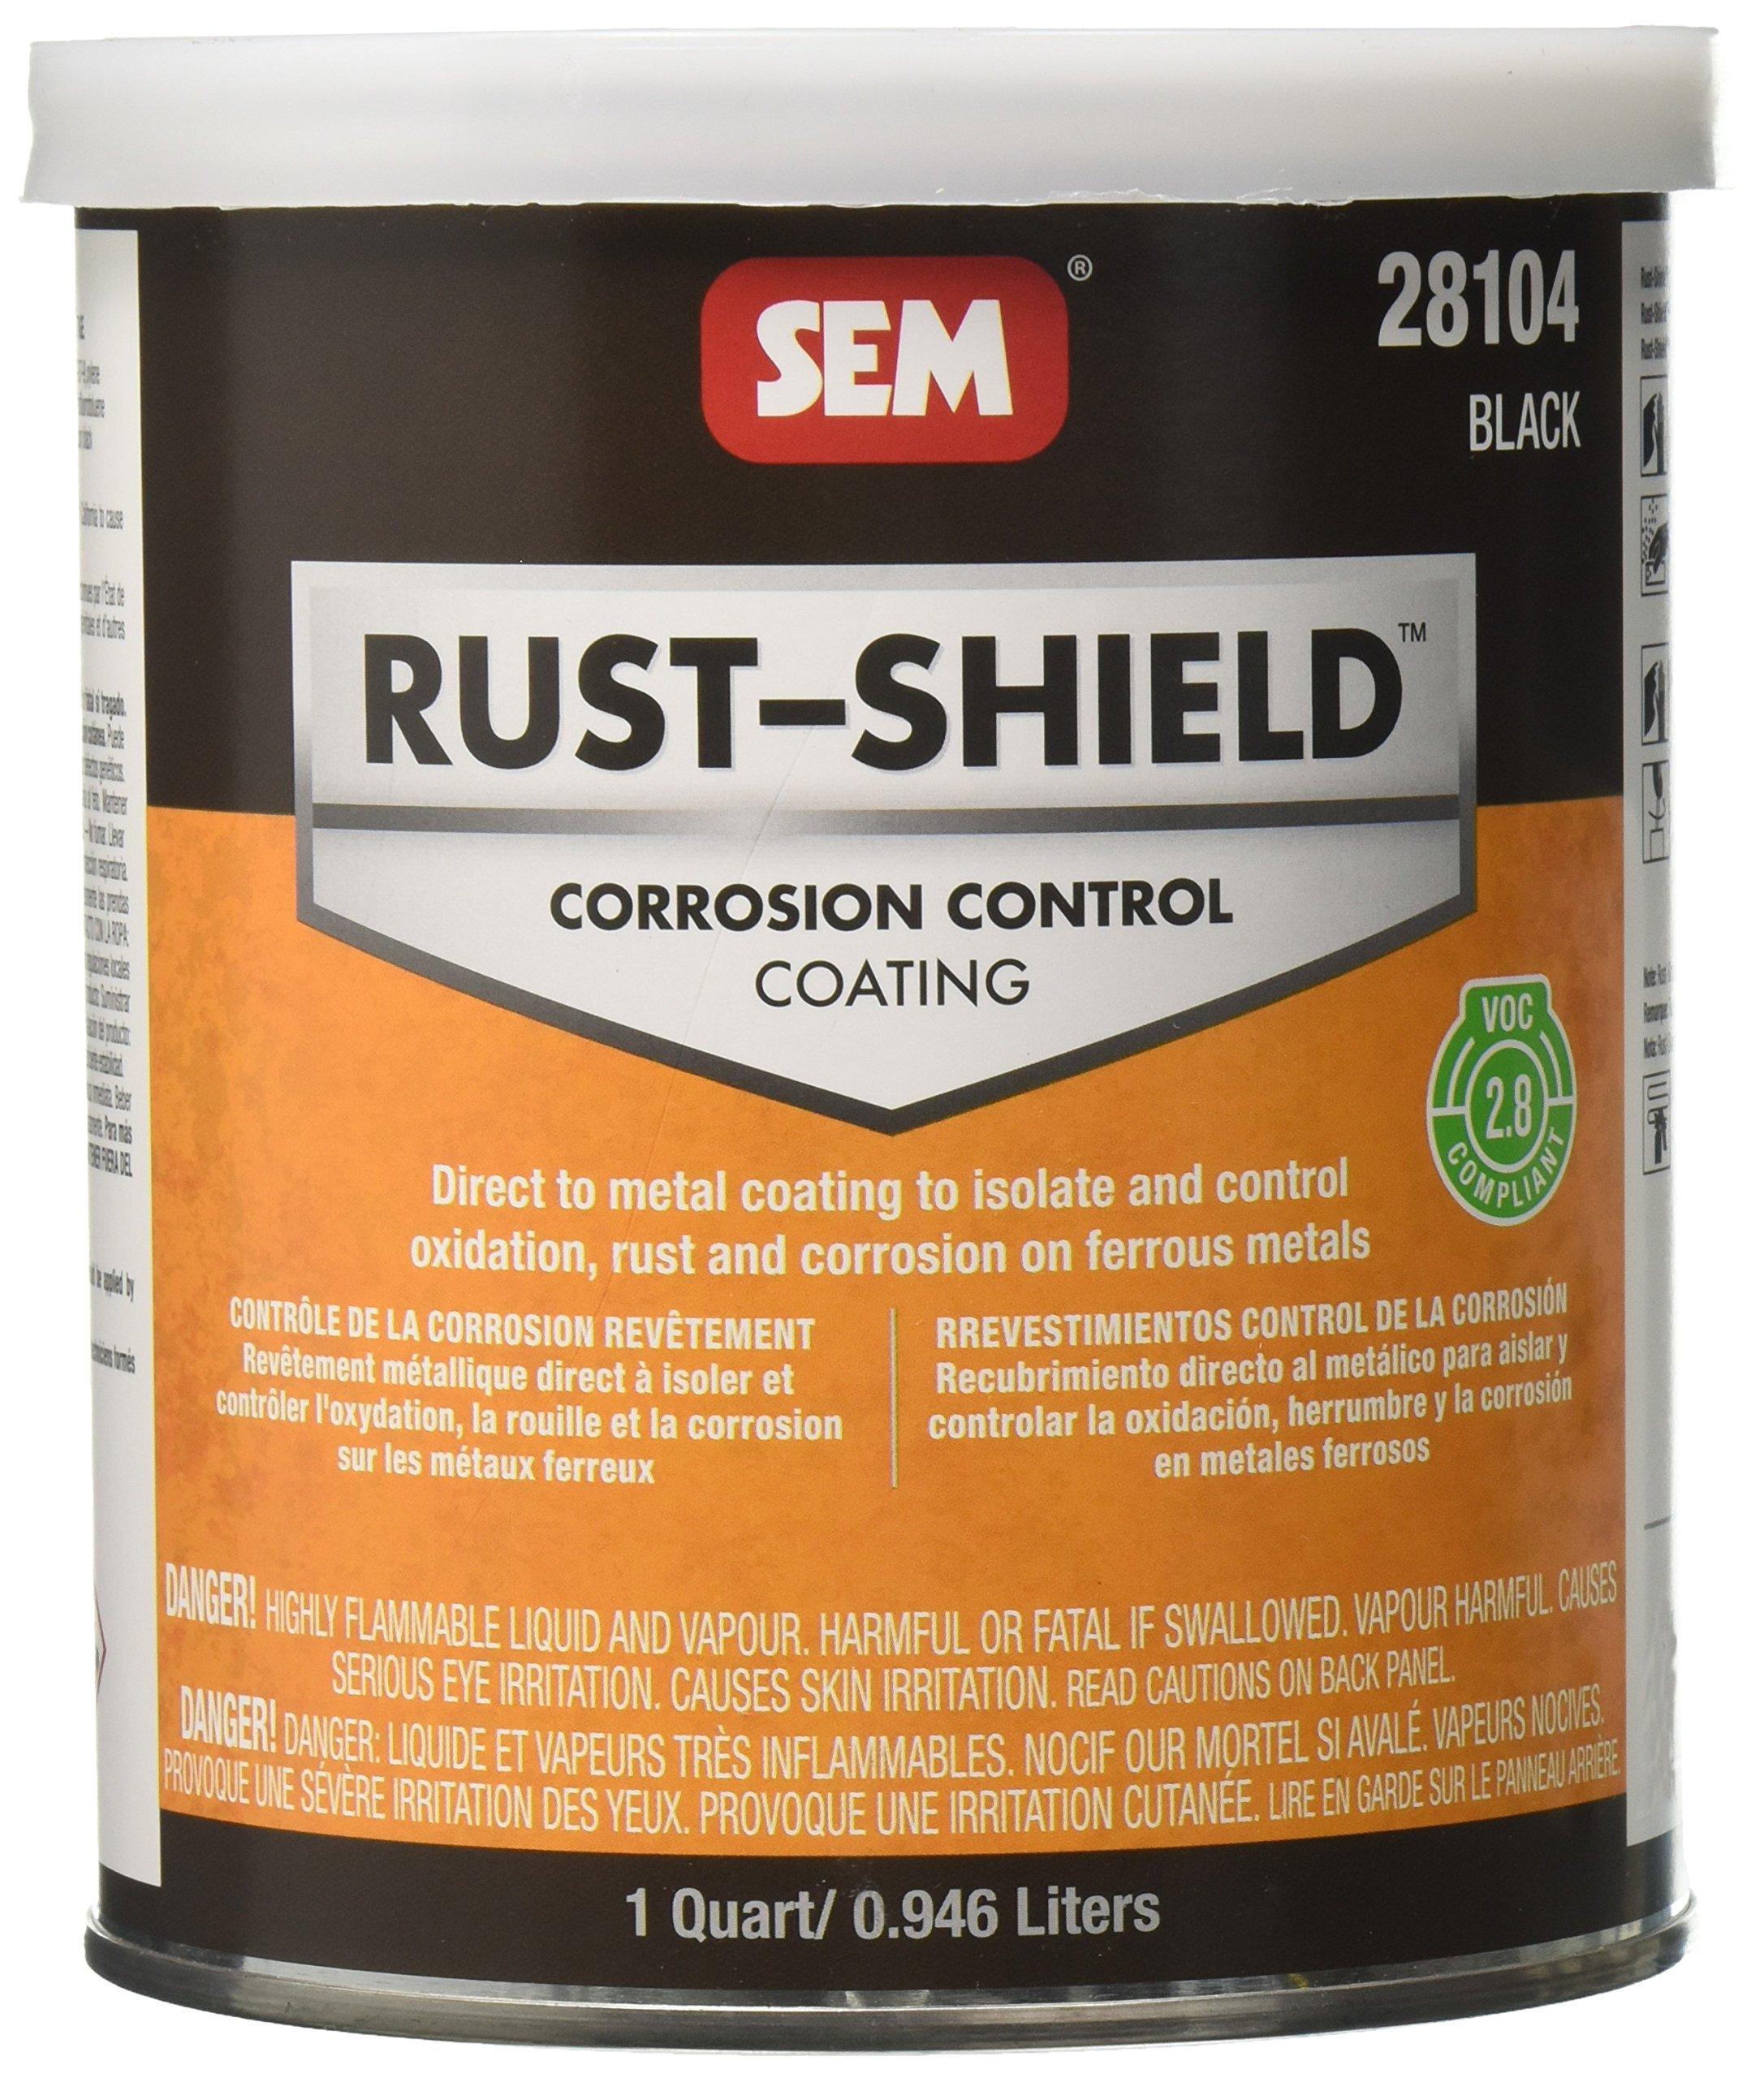 SEM 28104 2.8 VOC Rust Shield - 1 Quart